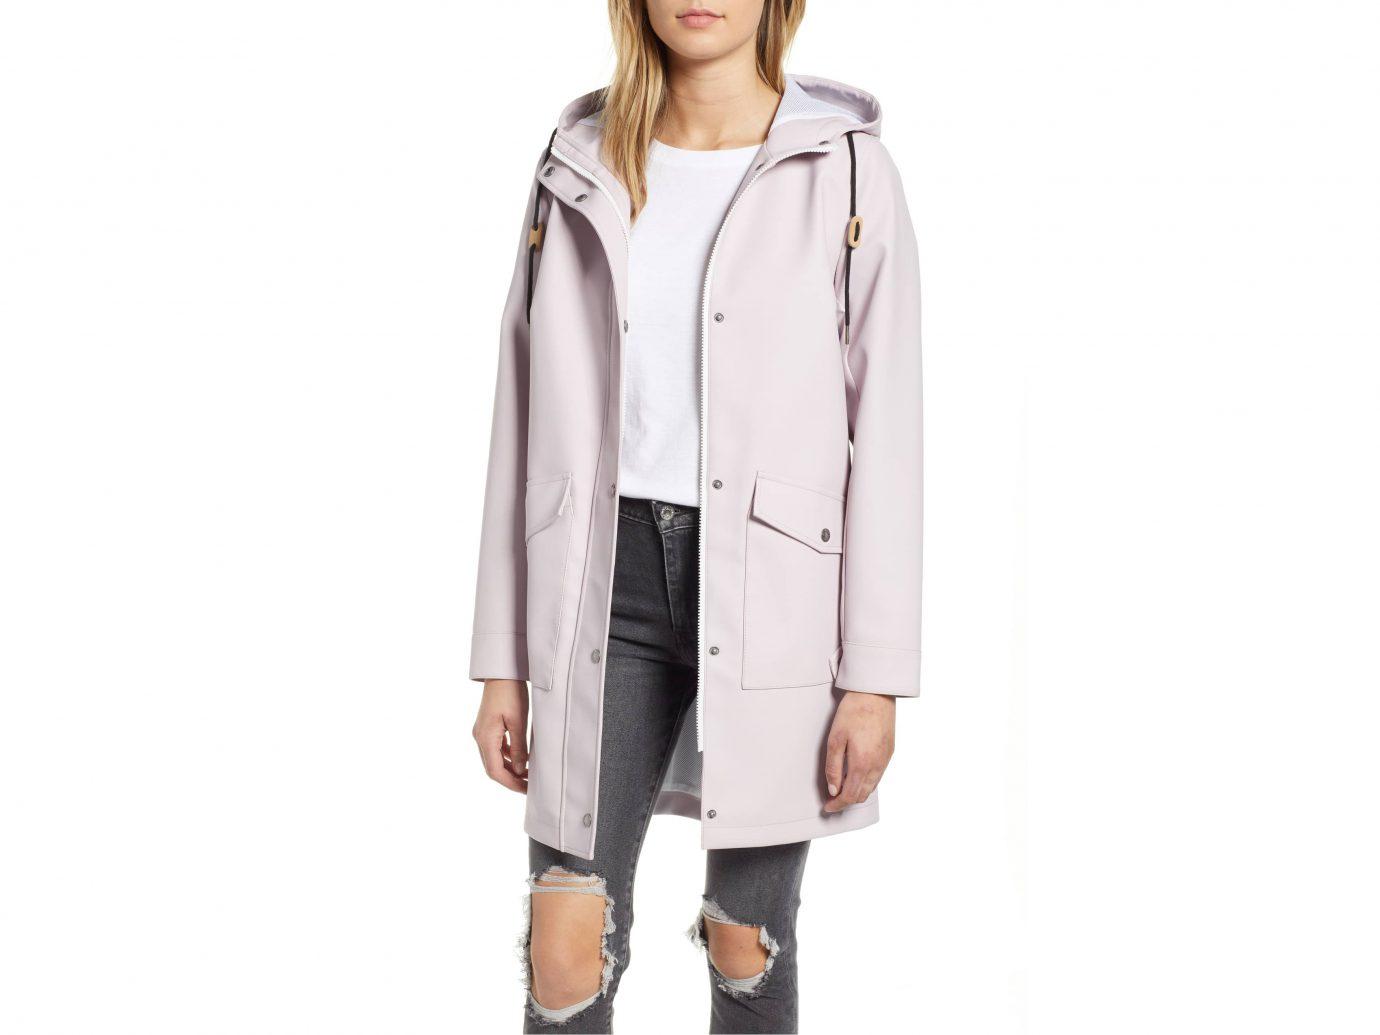 Levi's Rain Jacket